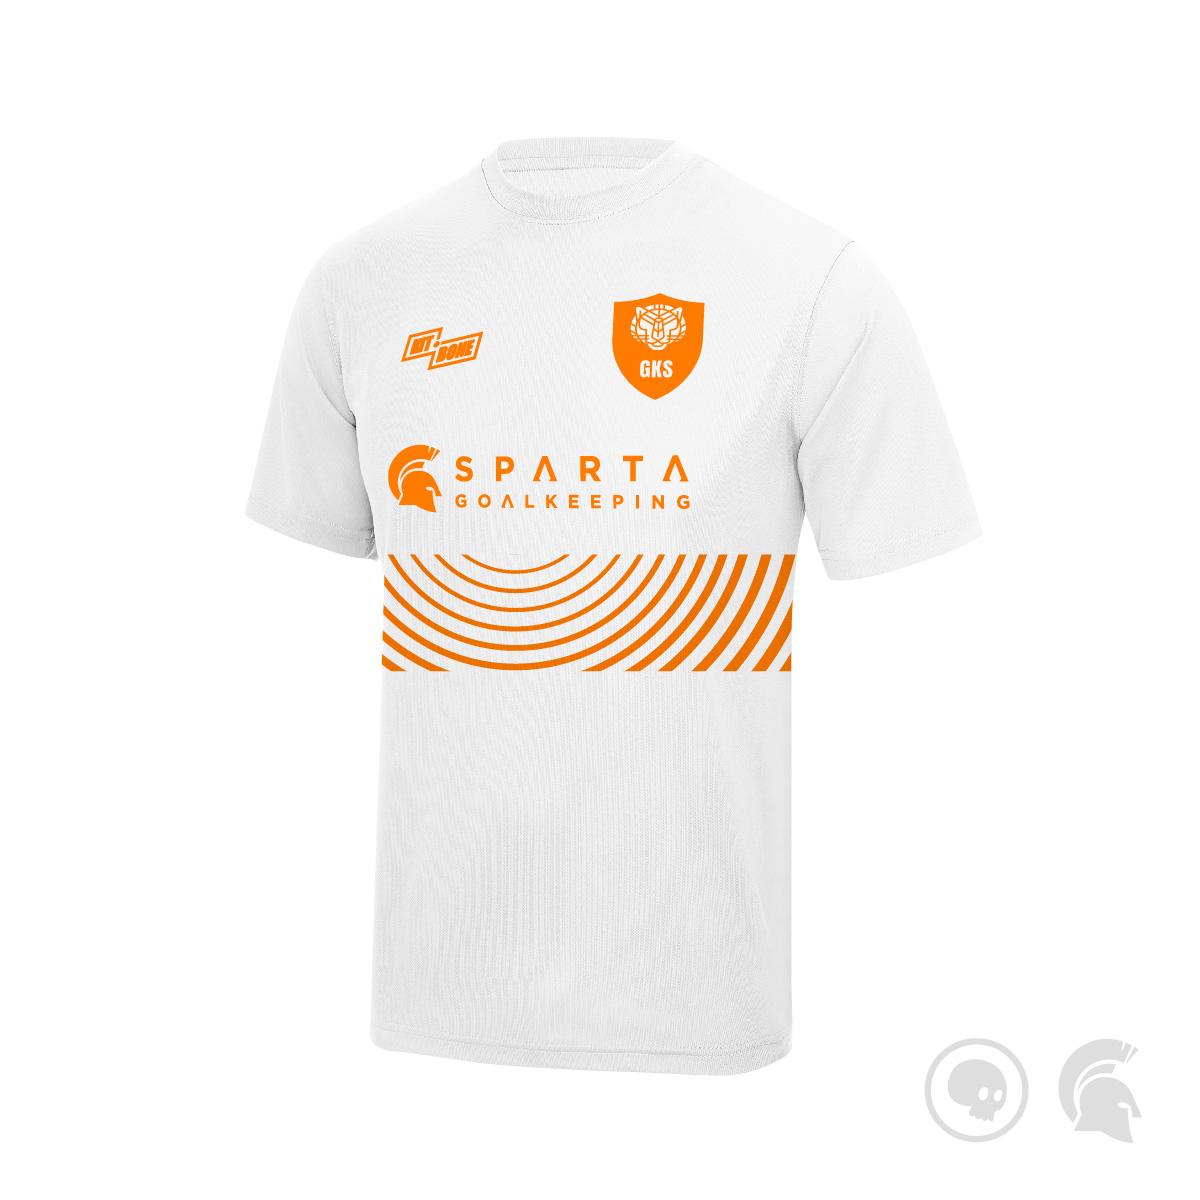 KitAndBone-Sparta-GKS_Colour Options-01.